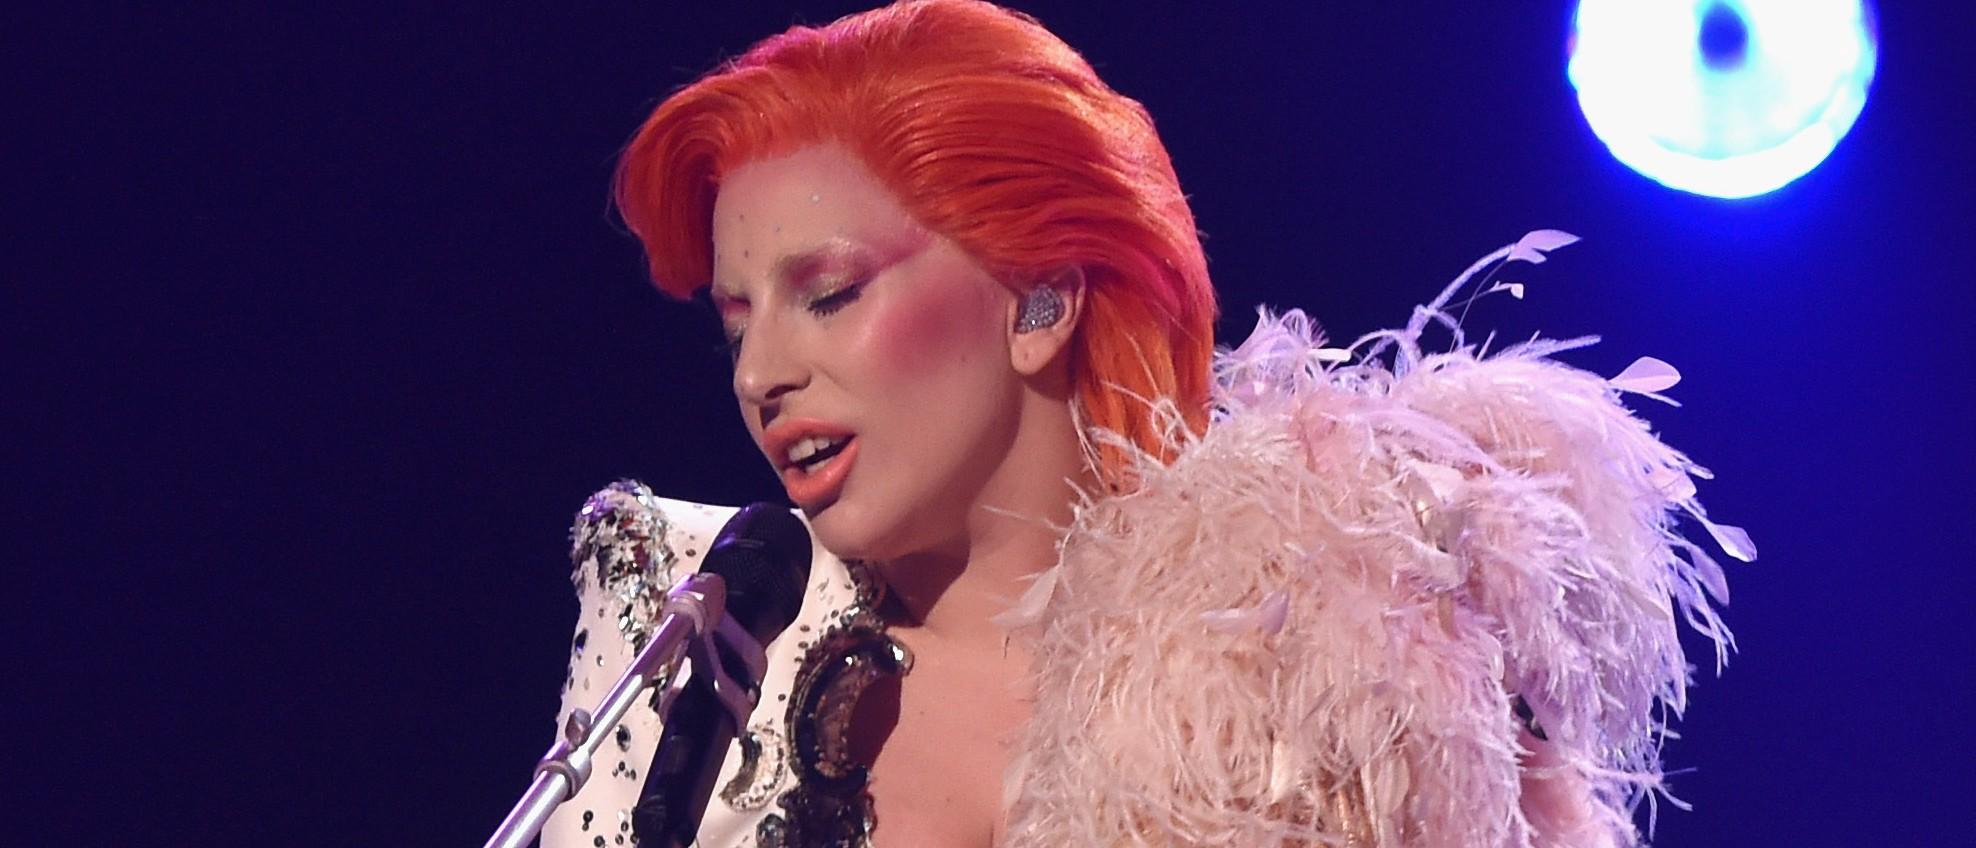 Lady Gaga's David Bowie tribute